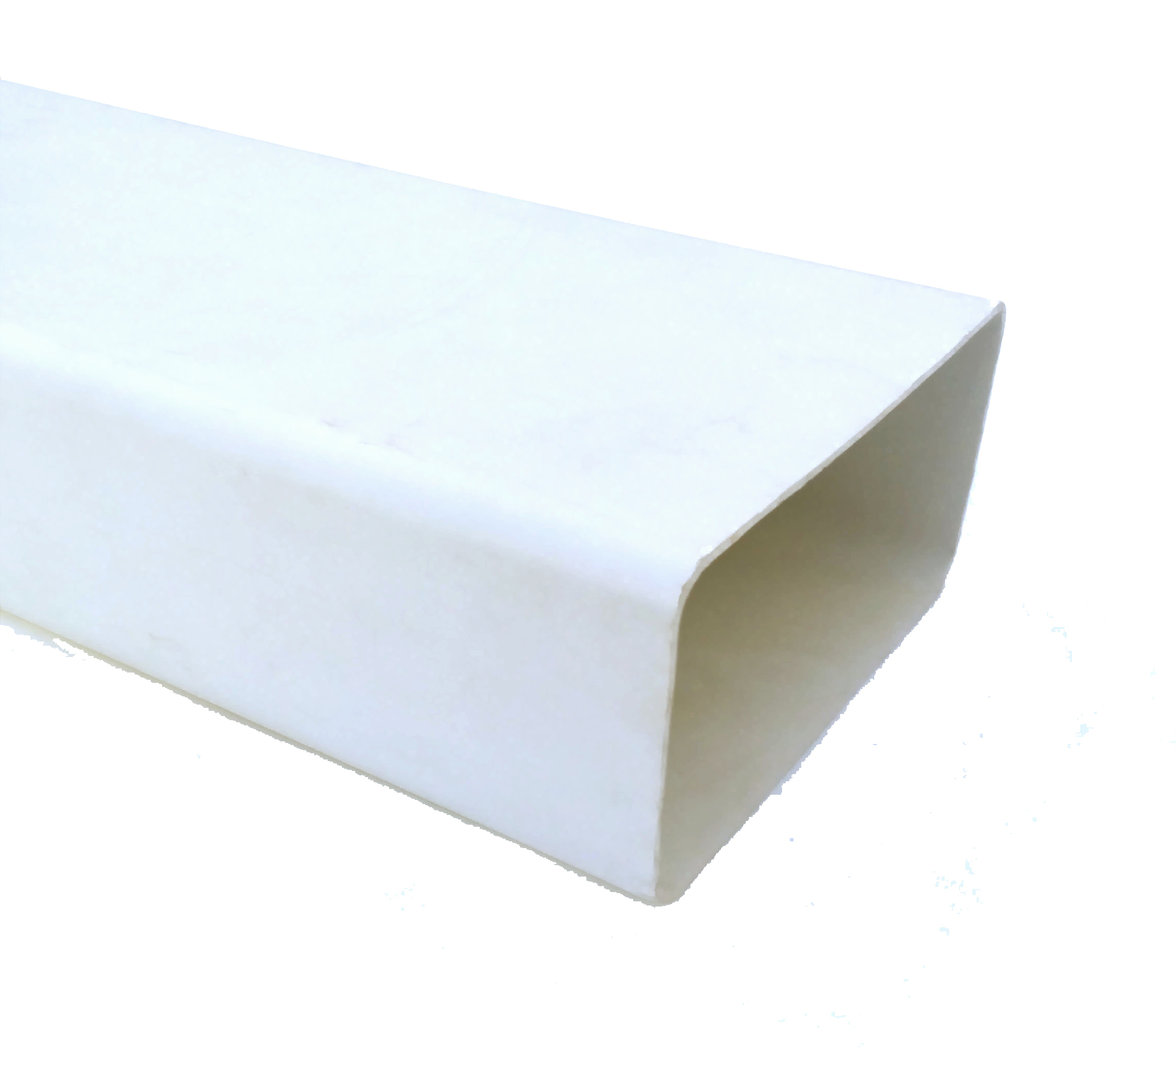 Tubo humos rectangular 55x110x1500 mm hinelco es for Tubo campana extractora rectangular